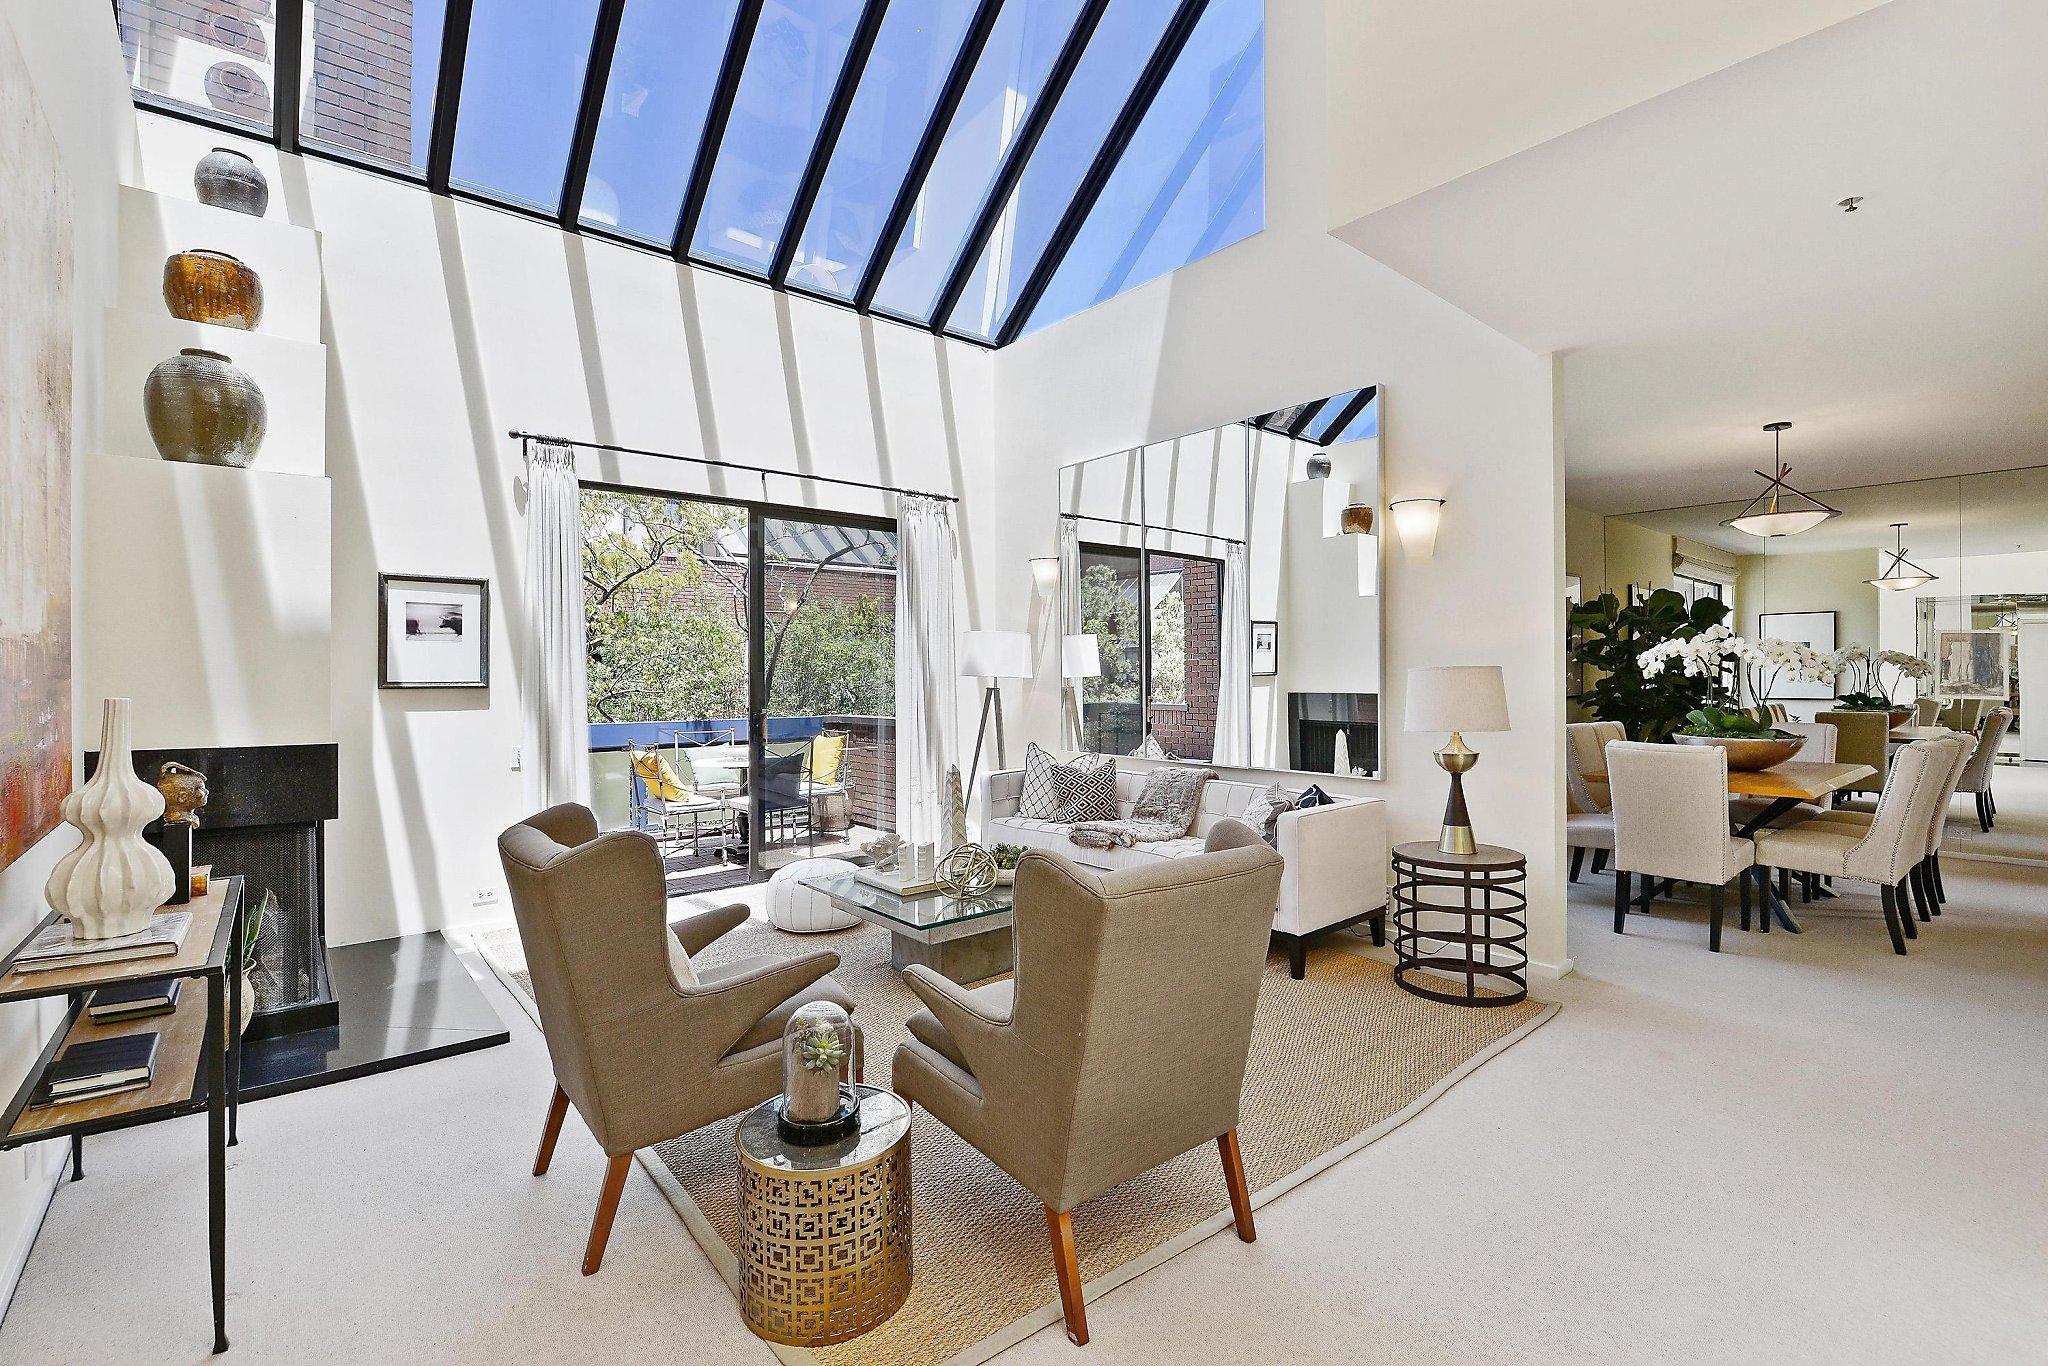 Three Bedroom Apartment In San Francisco S Financial District Open Sunday San Antonio Express News